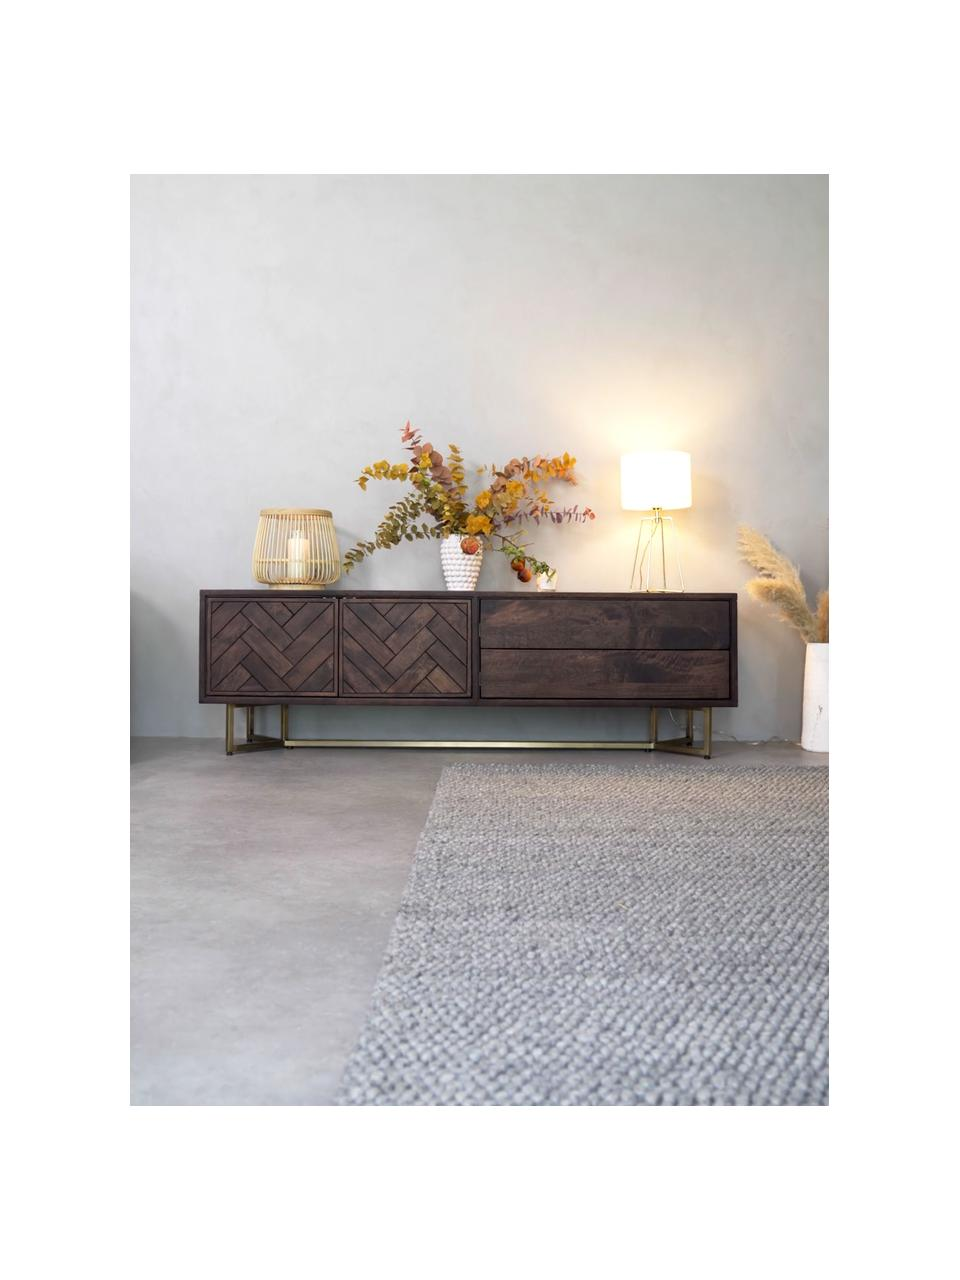 Visgraat dressoir Luca met deuren van massief hout, Frame: massief mangohout, Frame: gecoat metaal, Frame: mangohout. Frame, handvatten: messingkleurig, mat, 180 x 54 cm